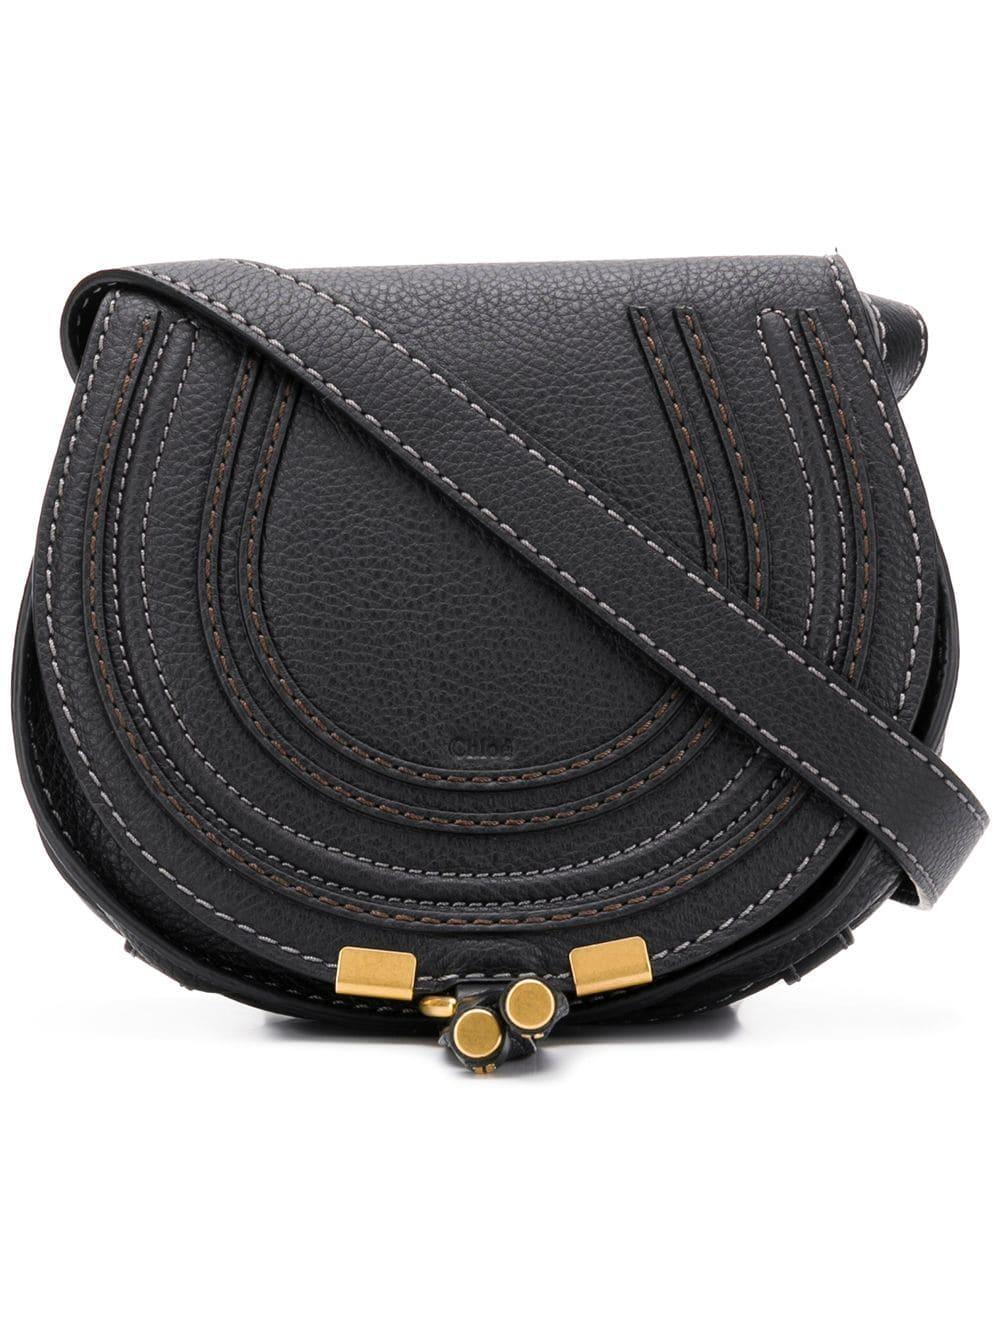 Marcie Small Bag Item # CHC11SP580161001